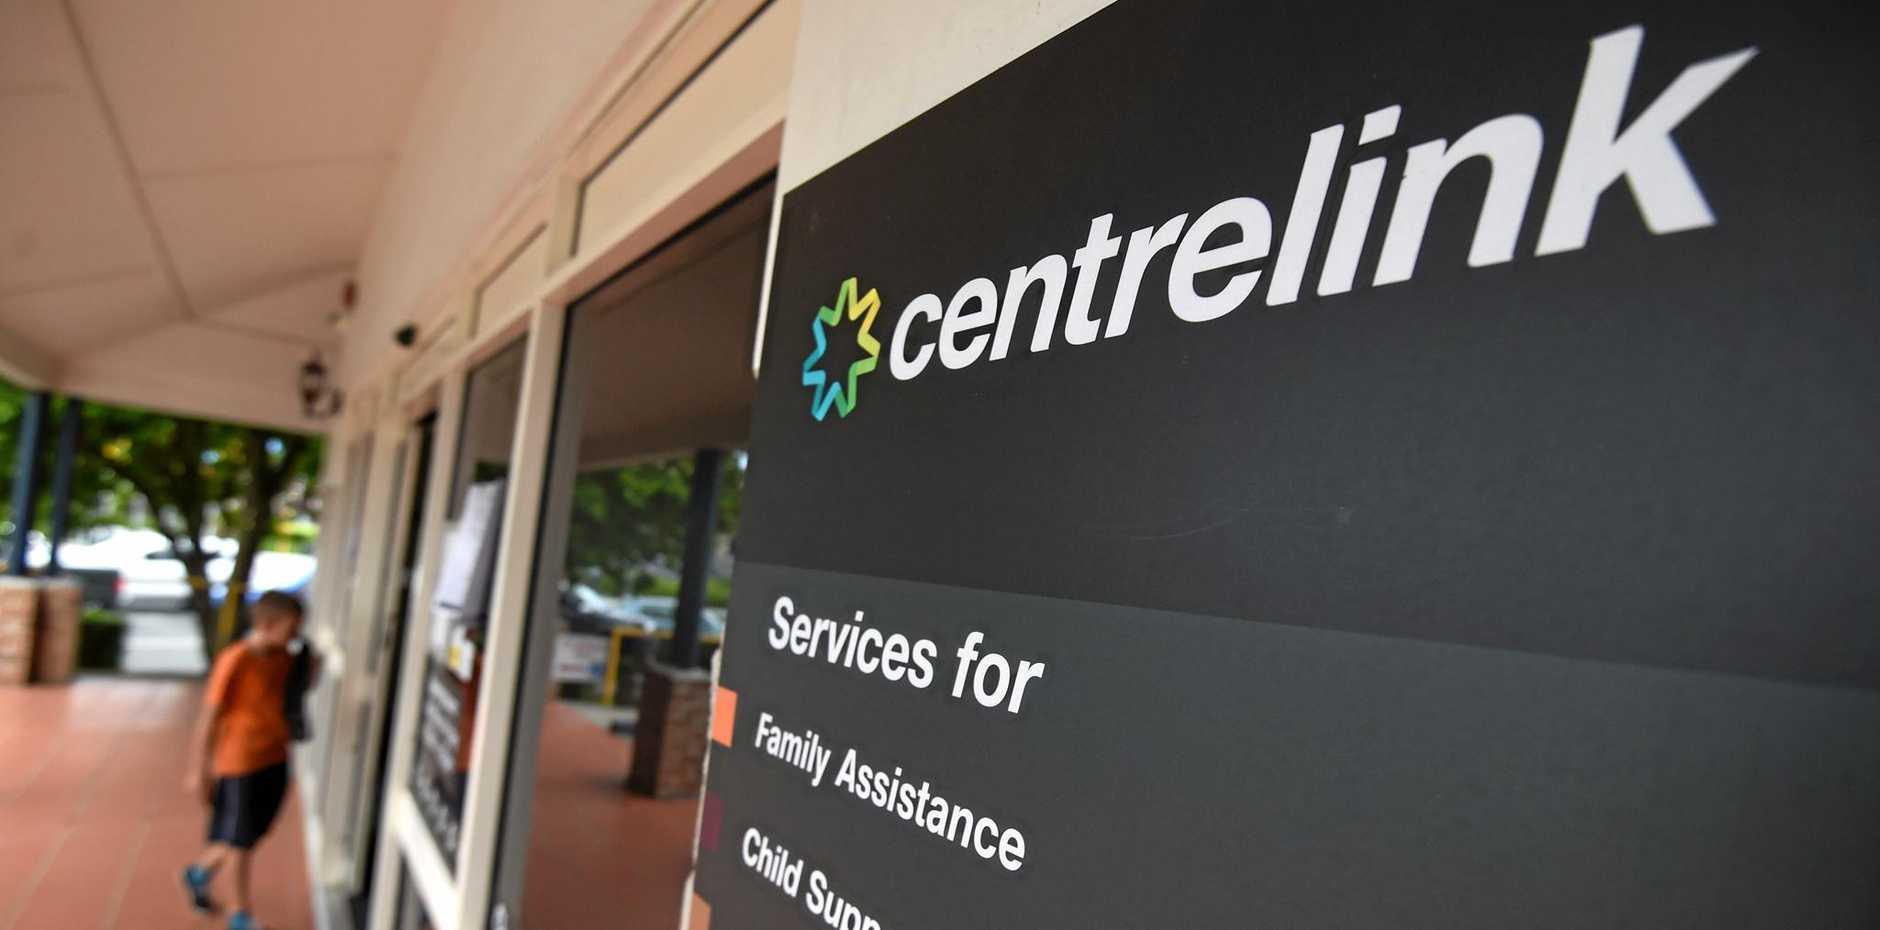 Tracey Green has spent years challenging Centrelink debts.